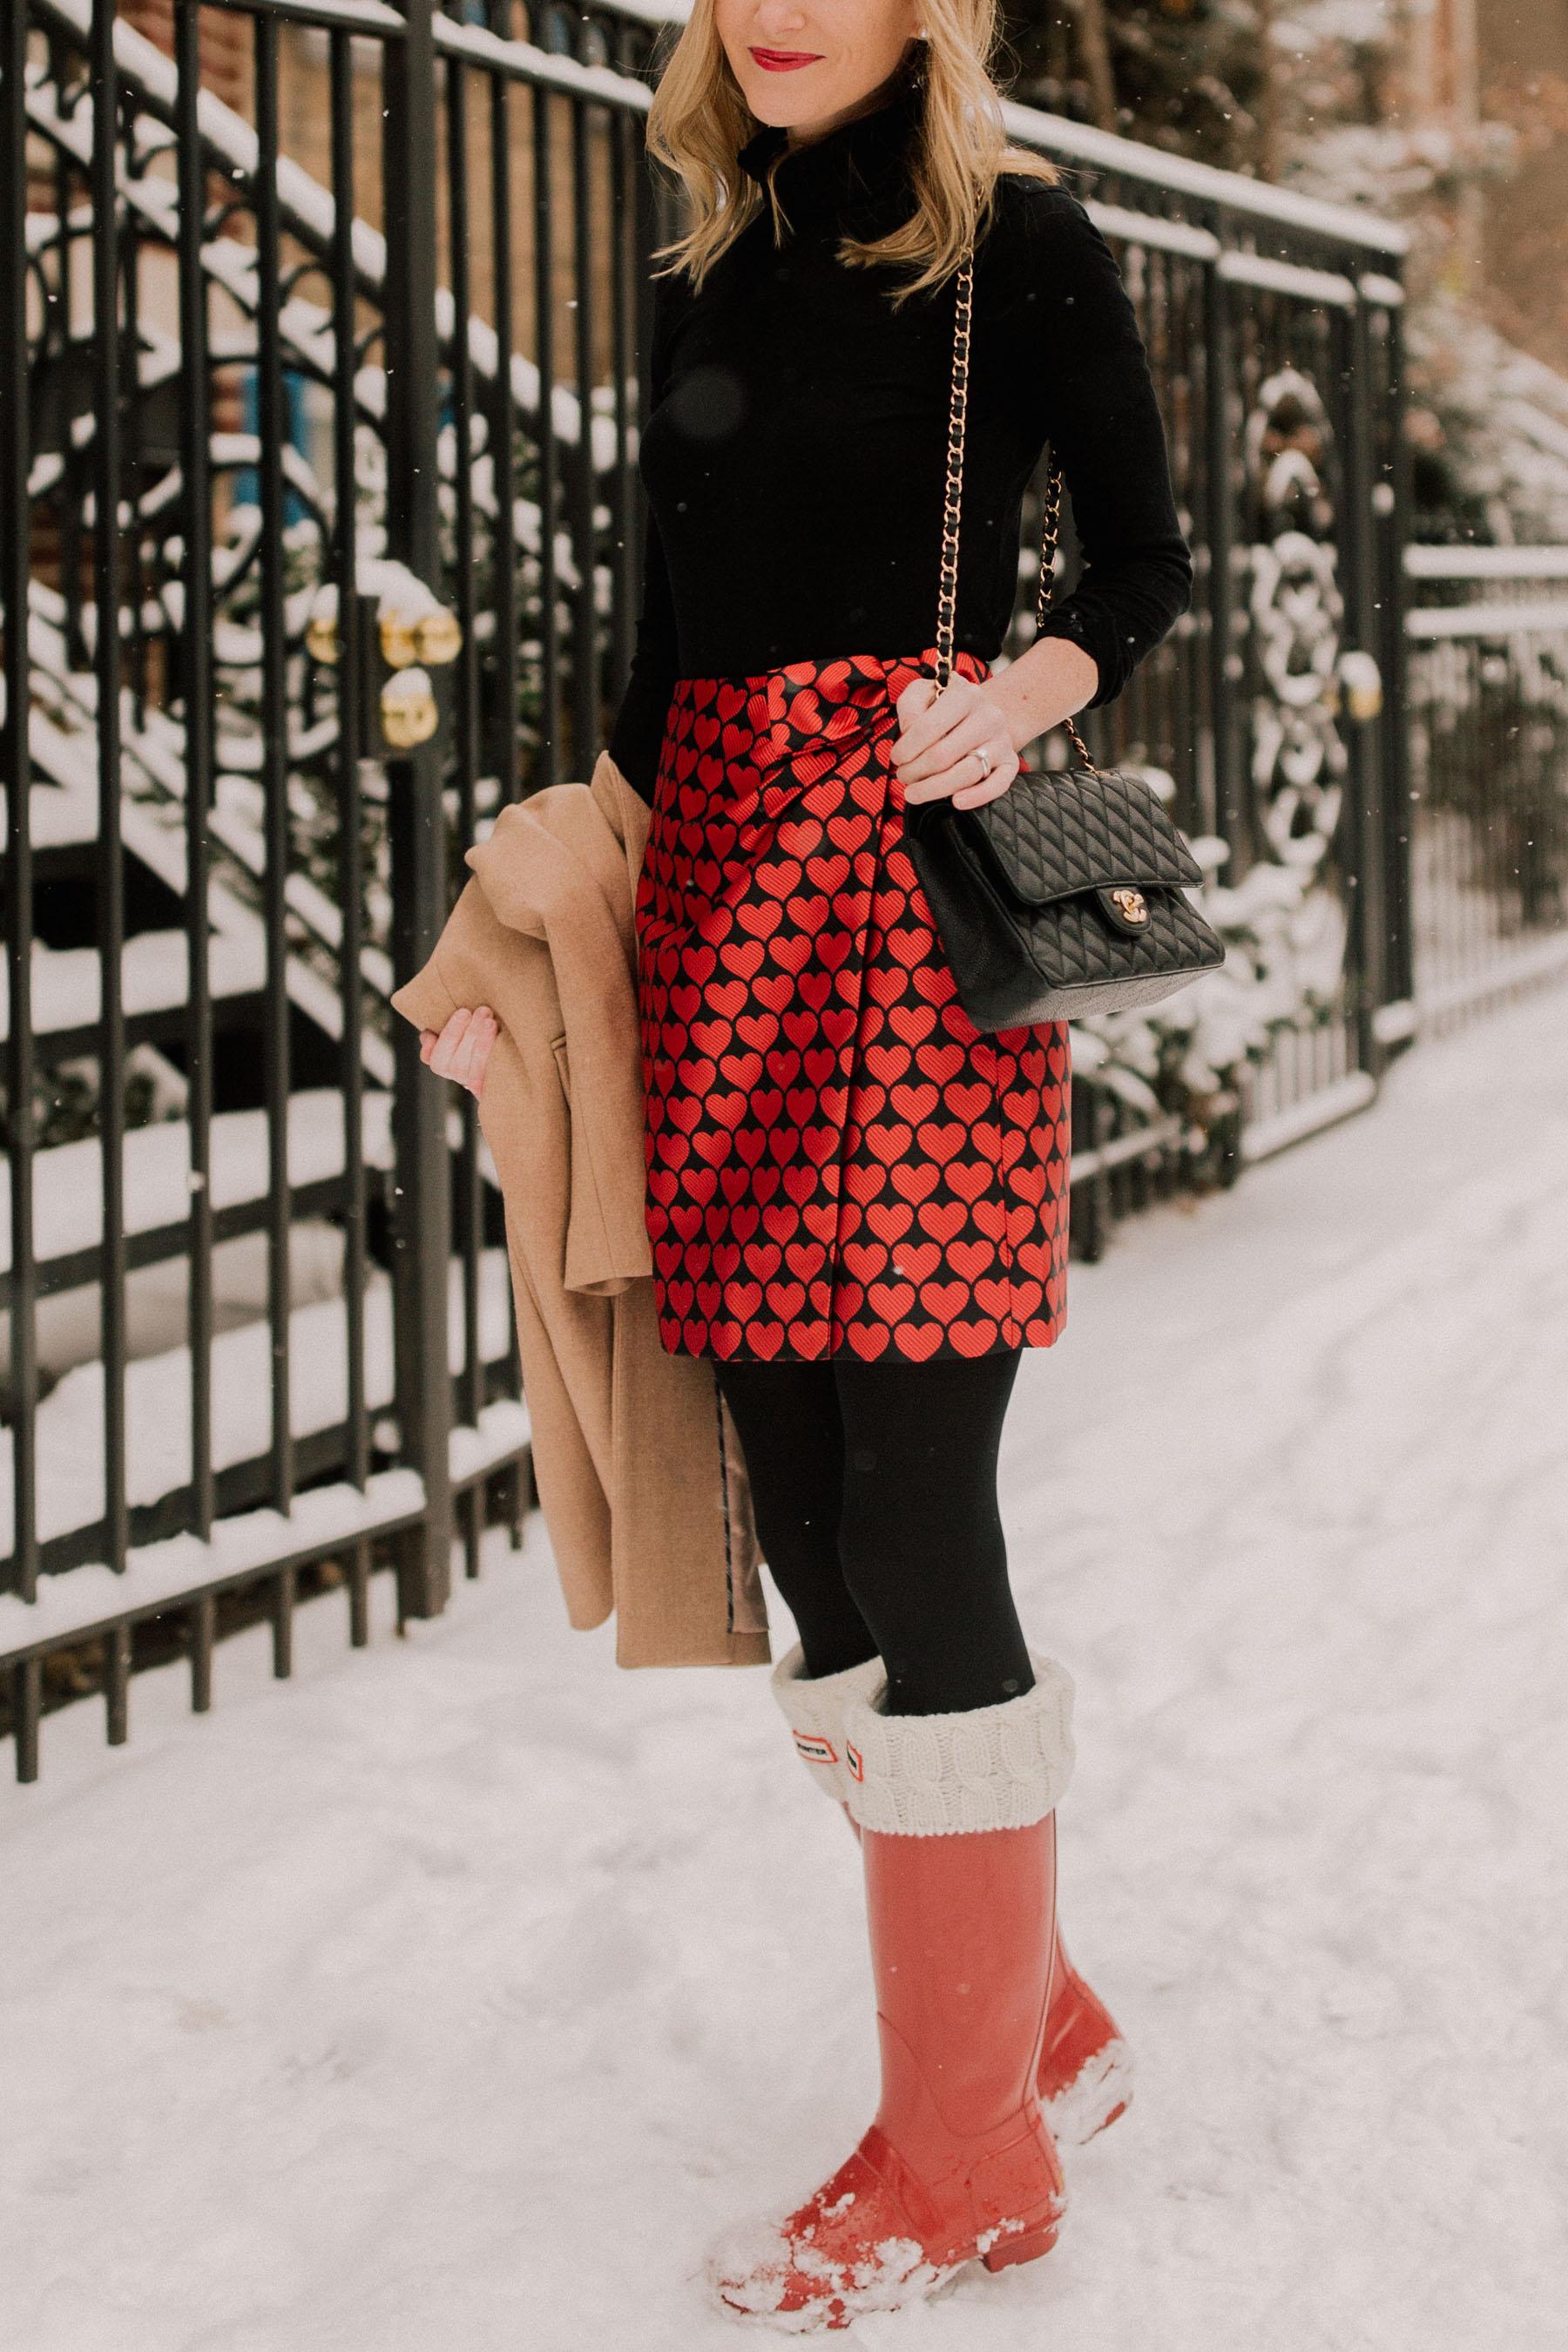 Heart Skirt / J.Crew Topcoat / Chanel Bag / Black Turtleneck / Hunter Boots / Black Tights - Kelly in the City